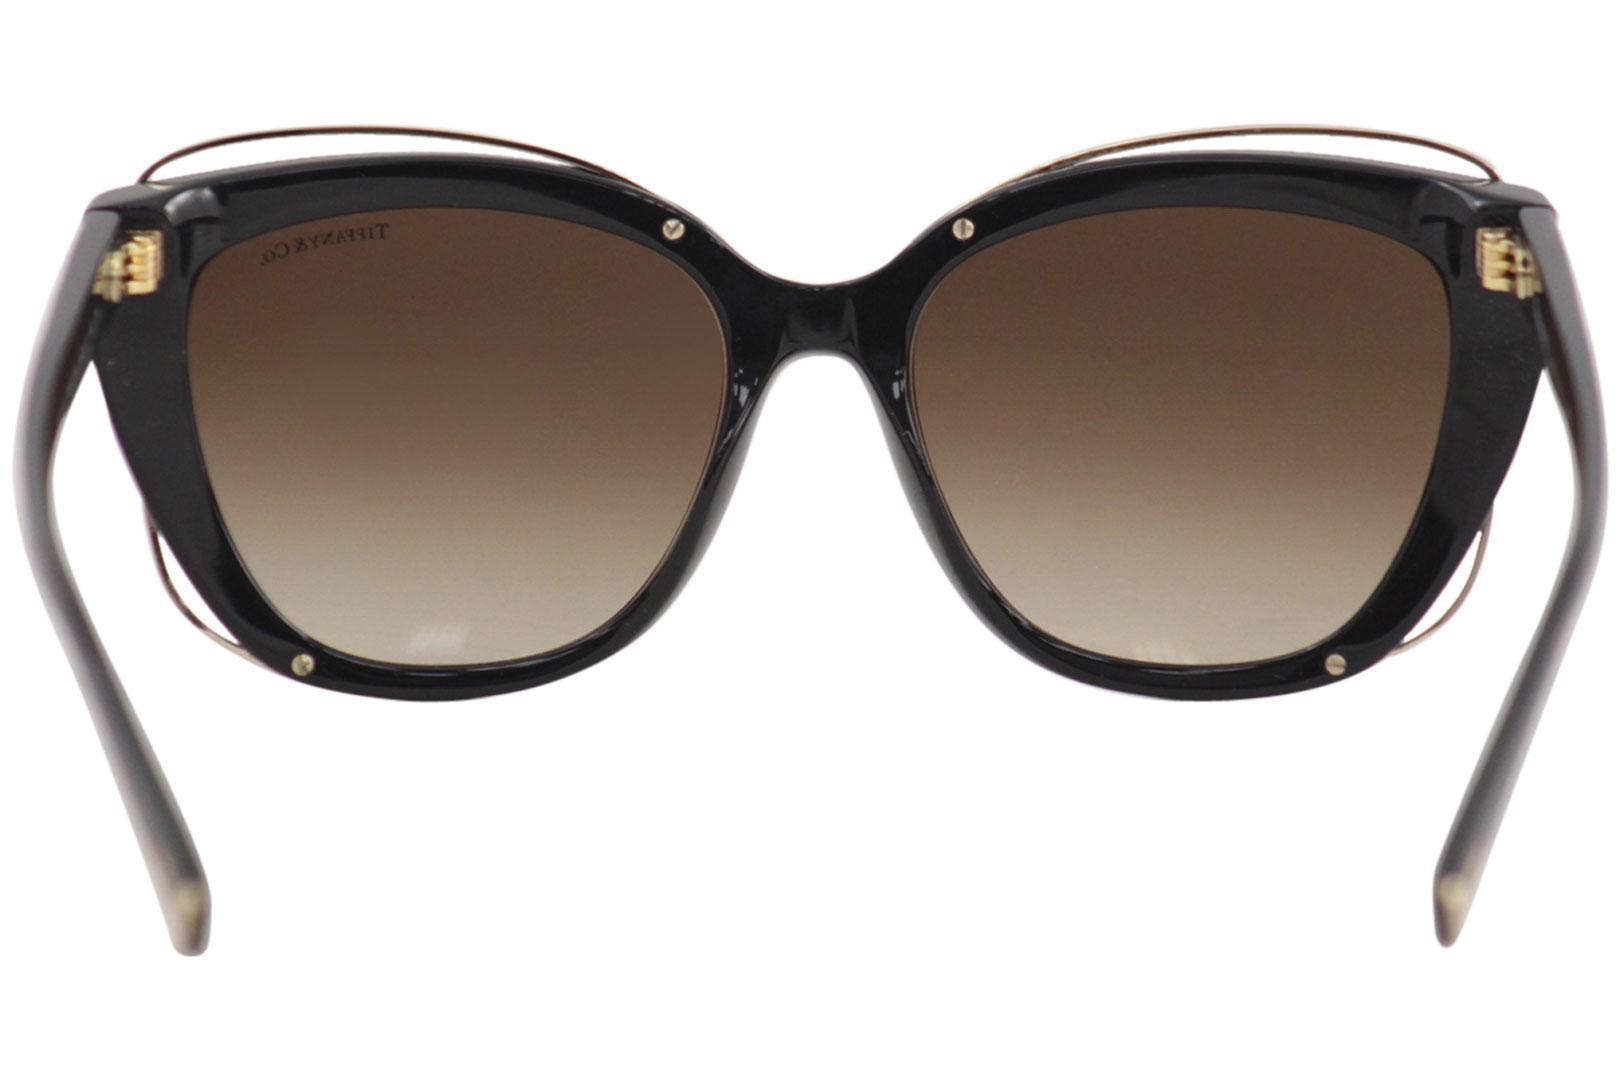 34a9eba4fd5f5 Women s TF4148 TF 4148 Fashion Cat Eye Sunglasses by Tiffany   Co.